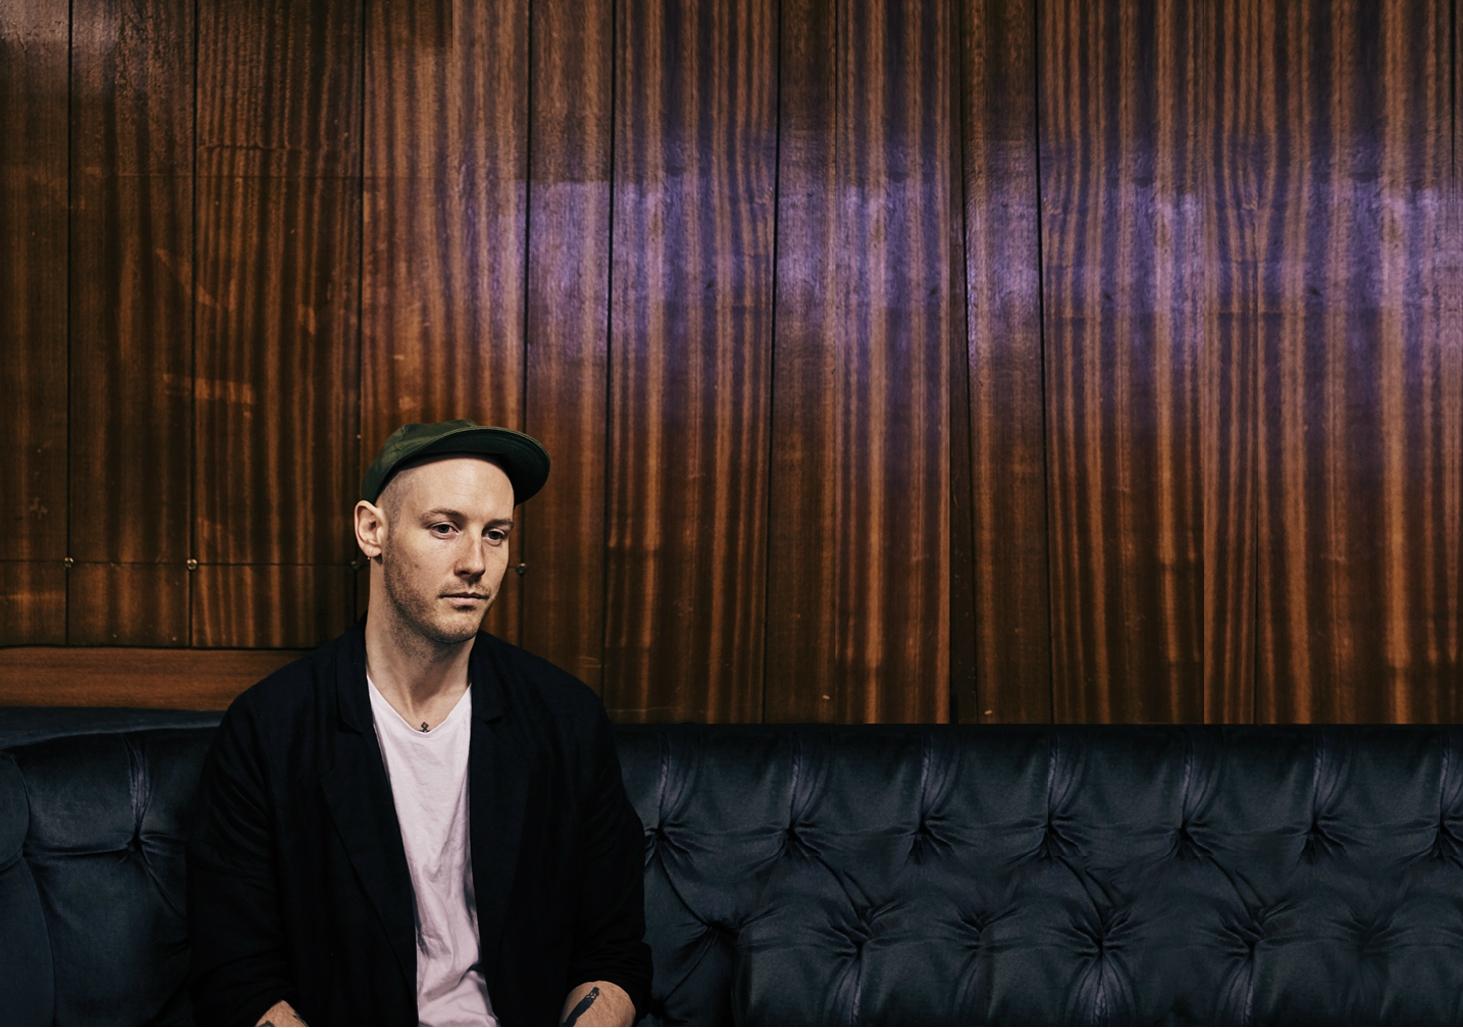 Joel Wells bends boundaries with new 'Harmony' track